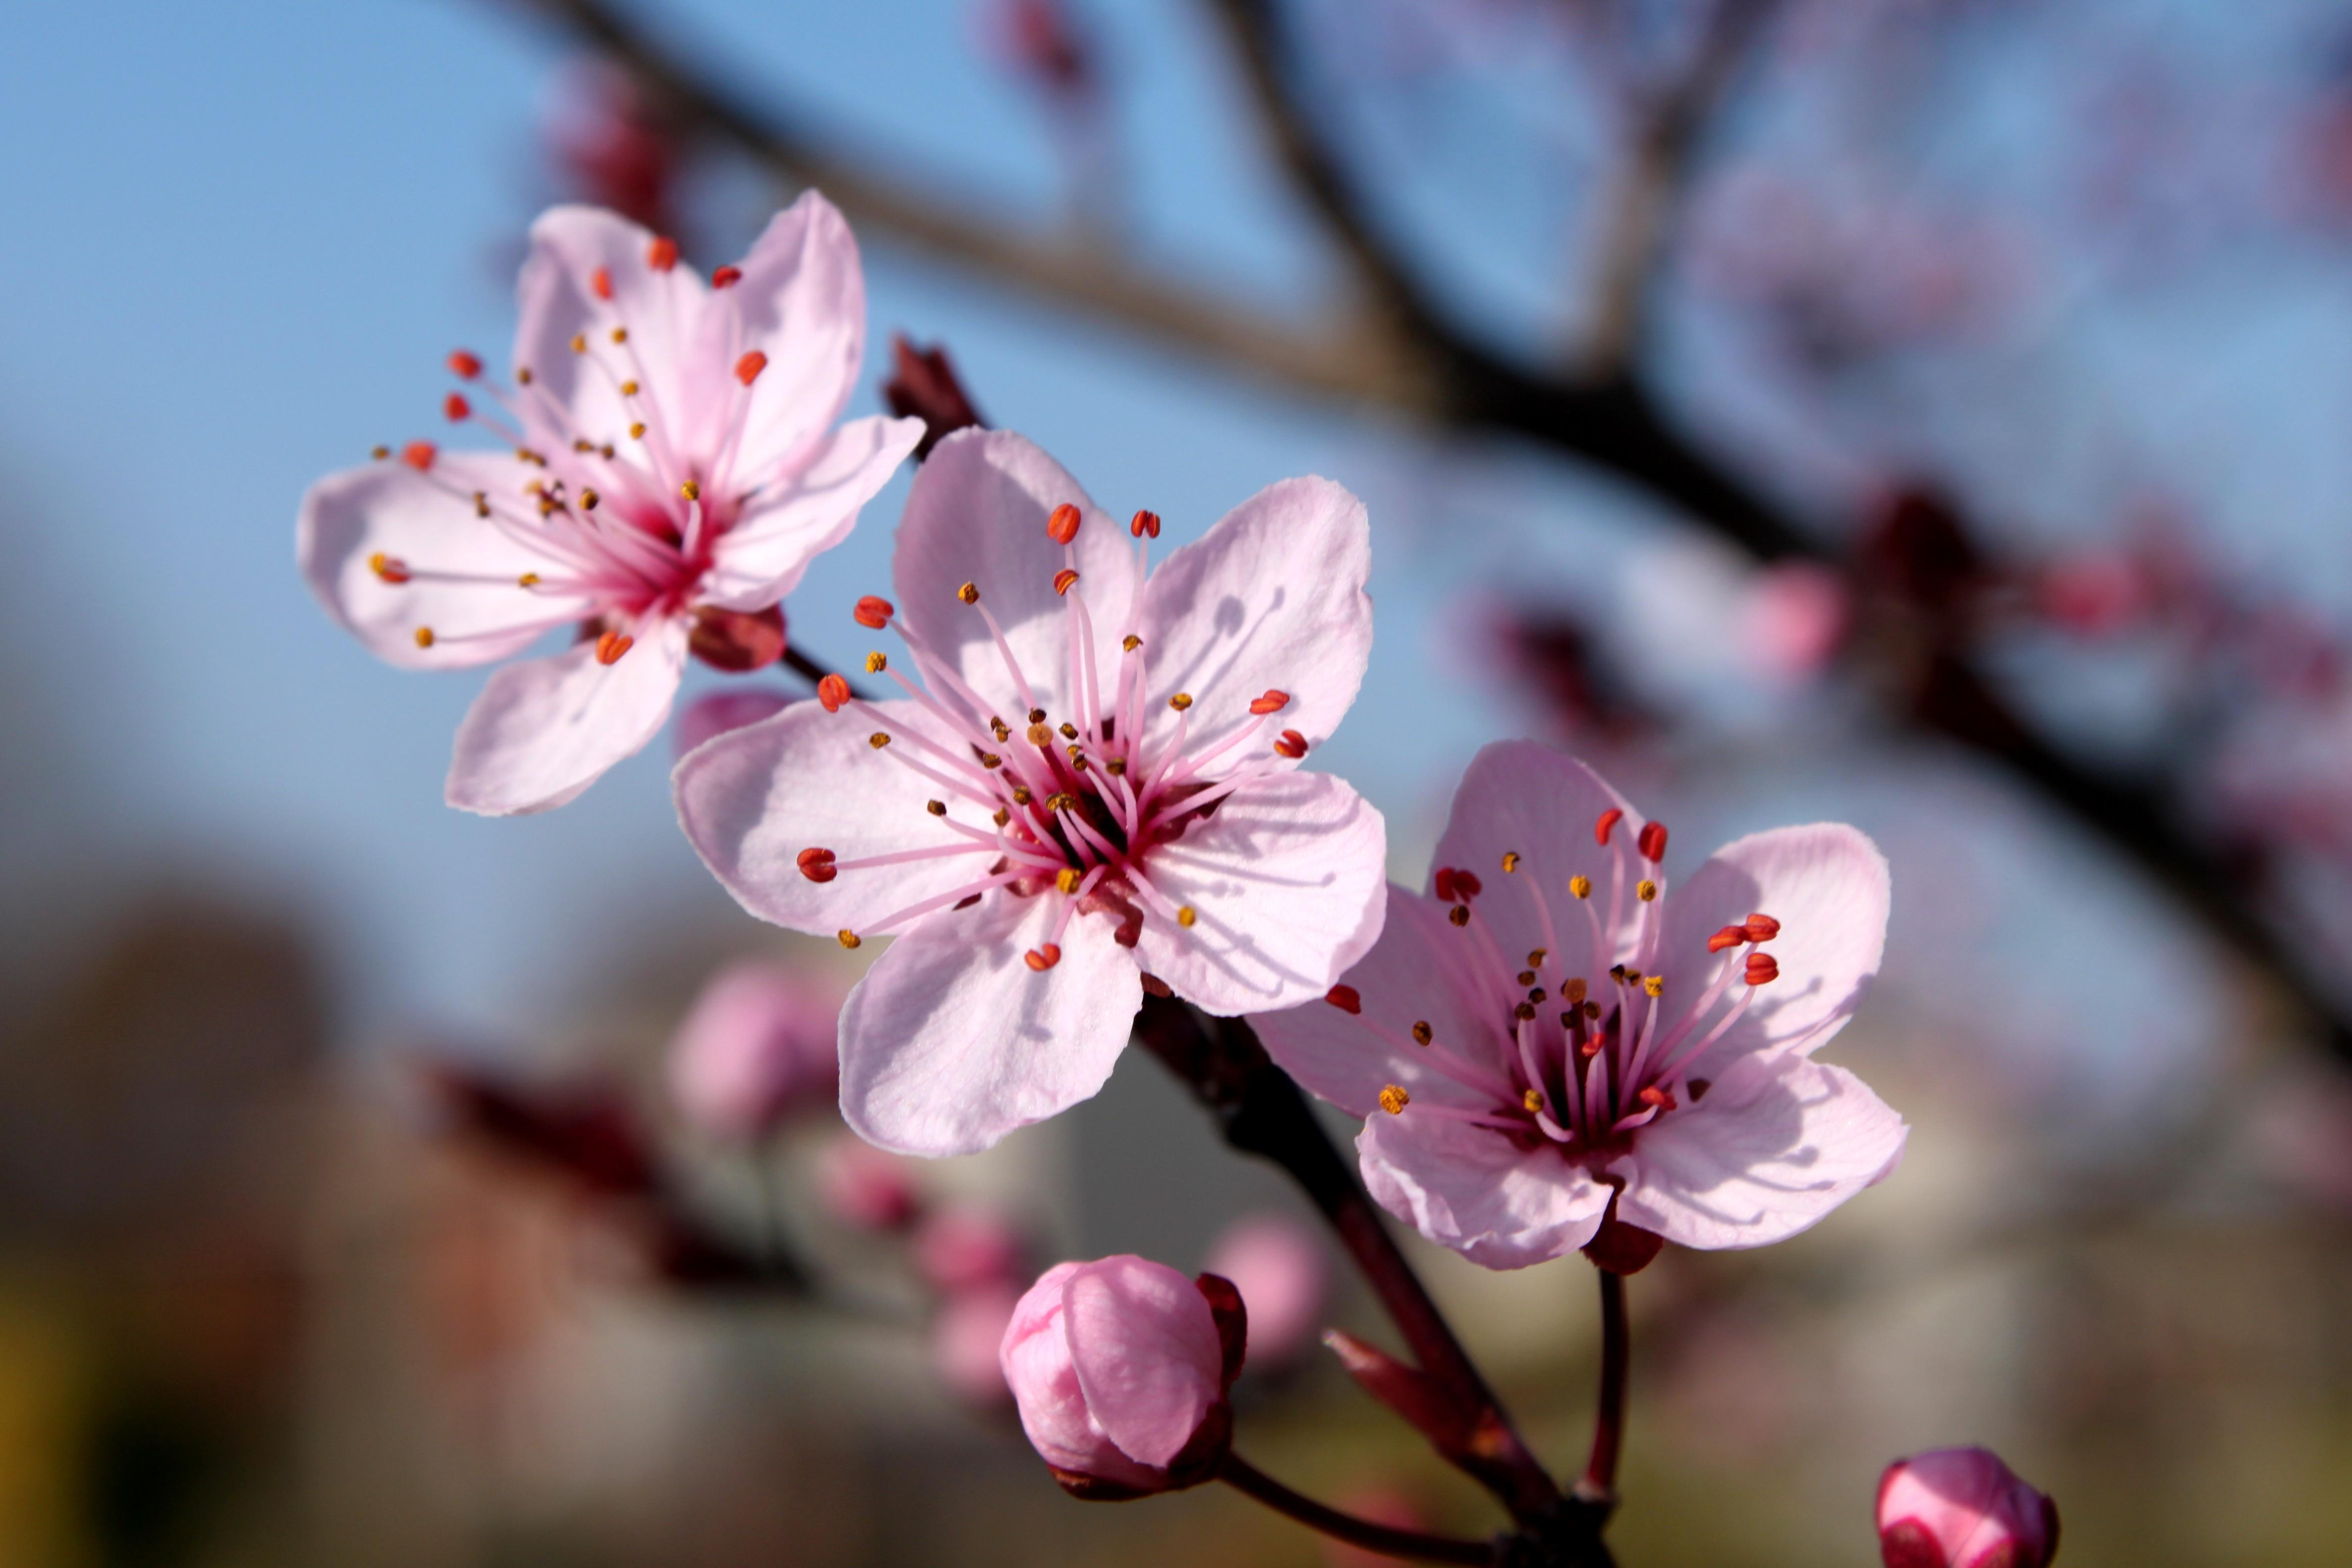 cherry_blossom_2_by_rickygw-d58jthn.jpg